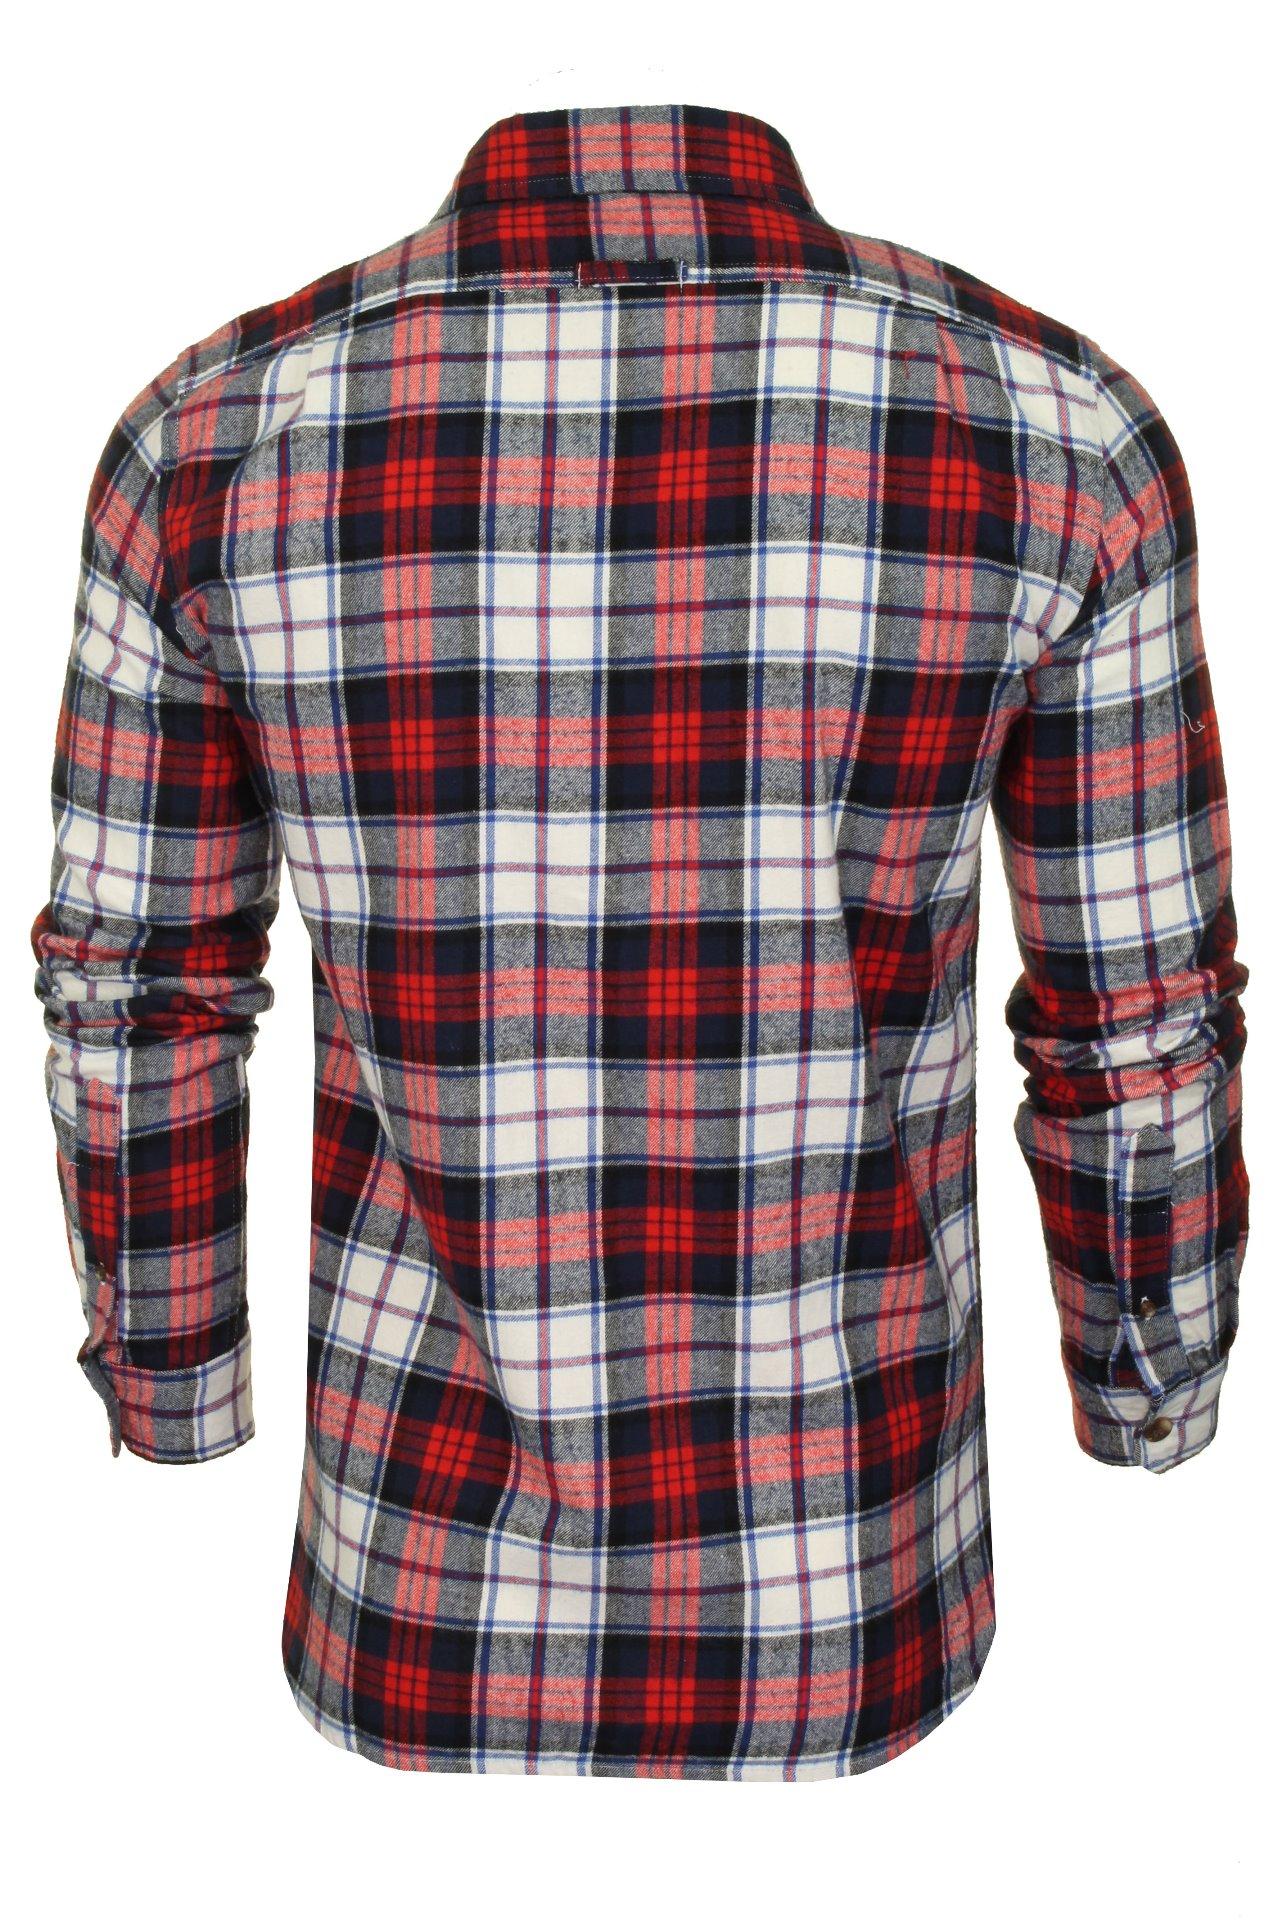 Superdry-Mens-Check-Shirt-039-Classic-Lumberjack-Shirt-039-Long-Sleeved thumbnail 8